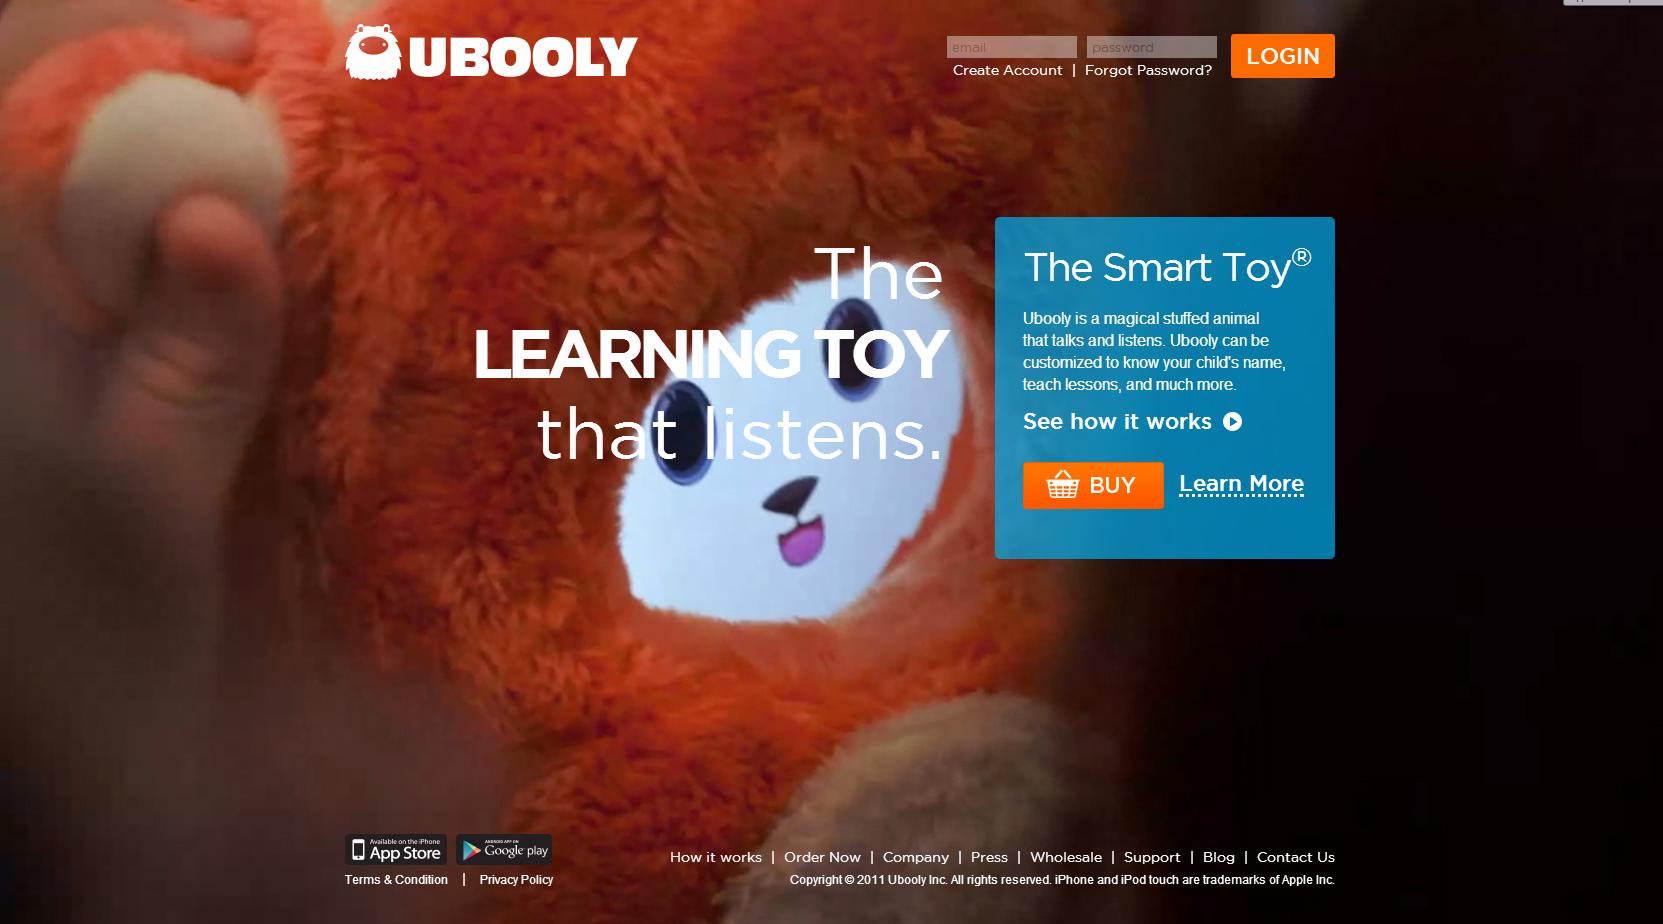 Ubooly Online Shop